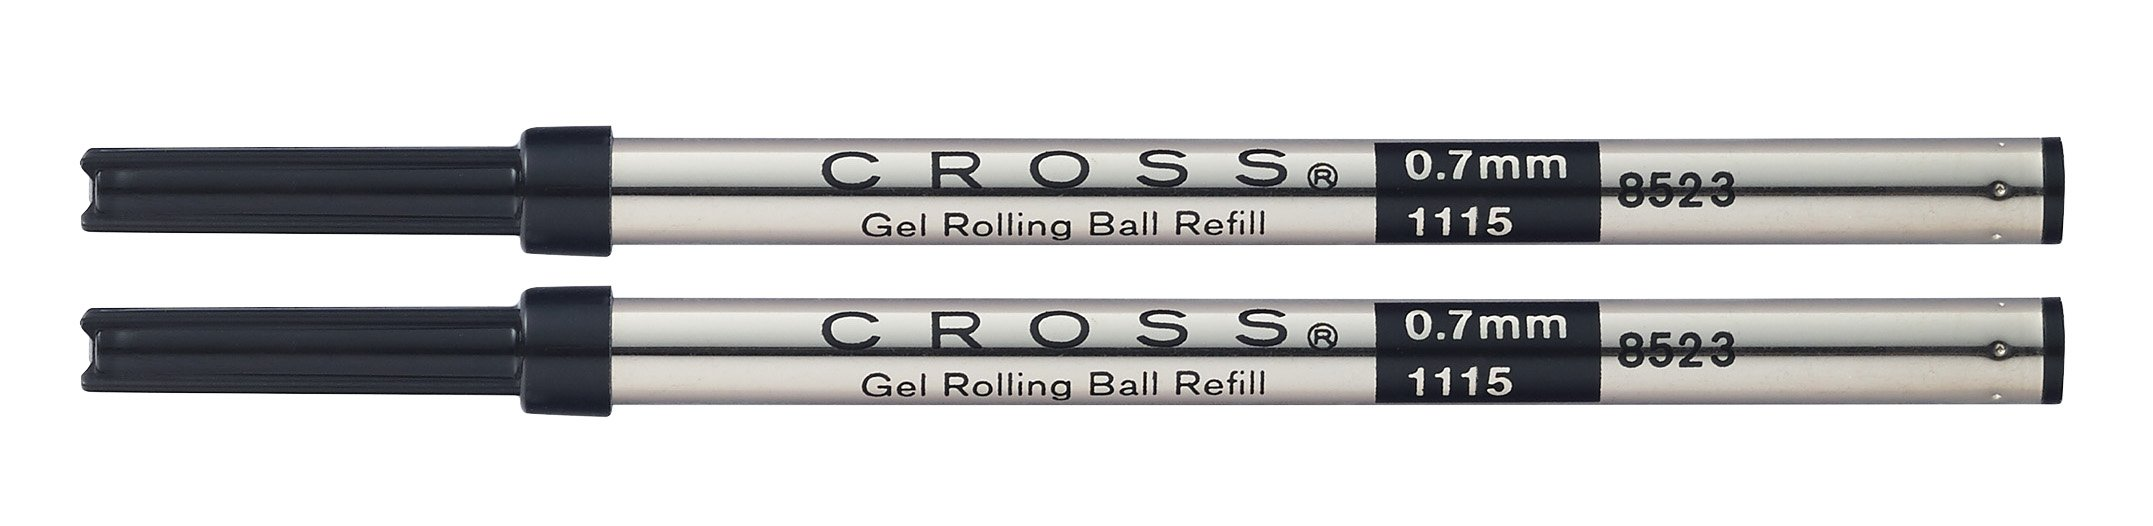 Cross 8523-2 Black Gel Rolling Ball Refills 2-Pack